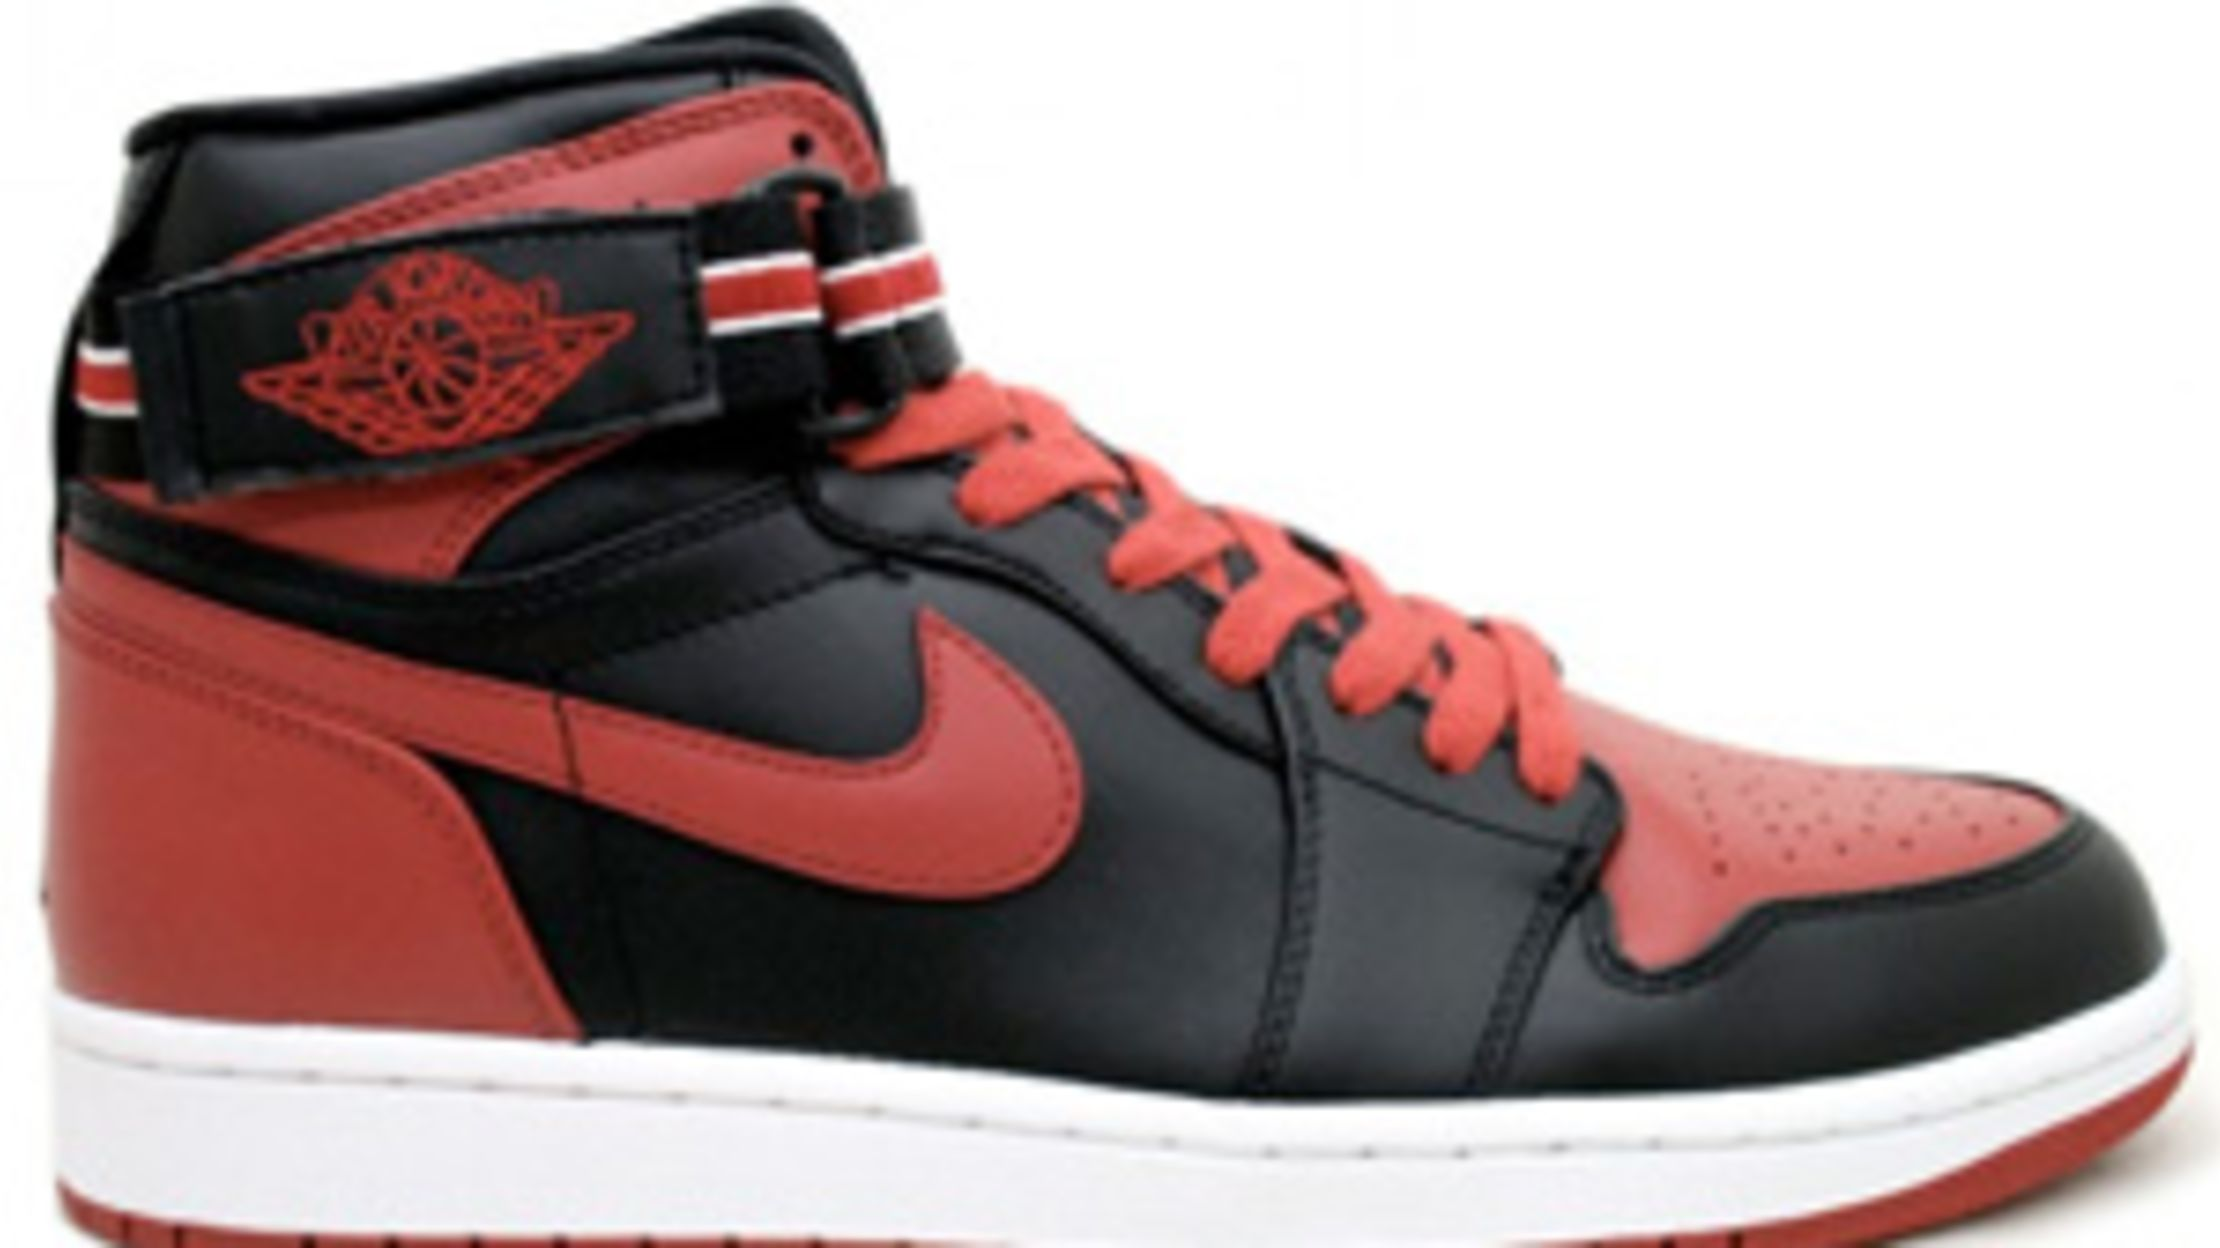 Picture of NBA Kicks: Nike Shoes Jordan 11 Retro Basketball